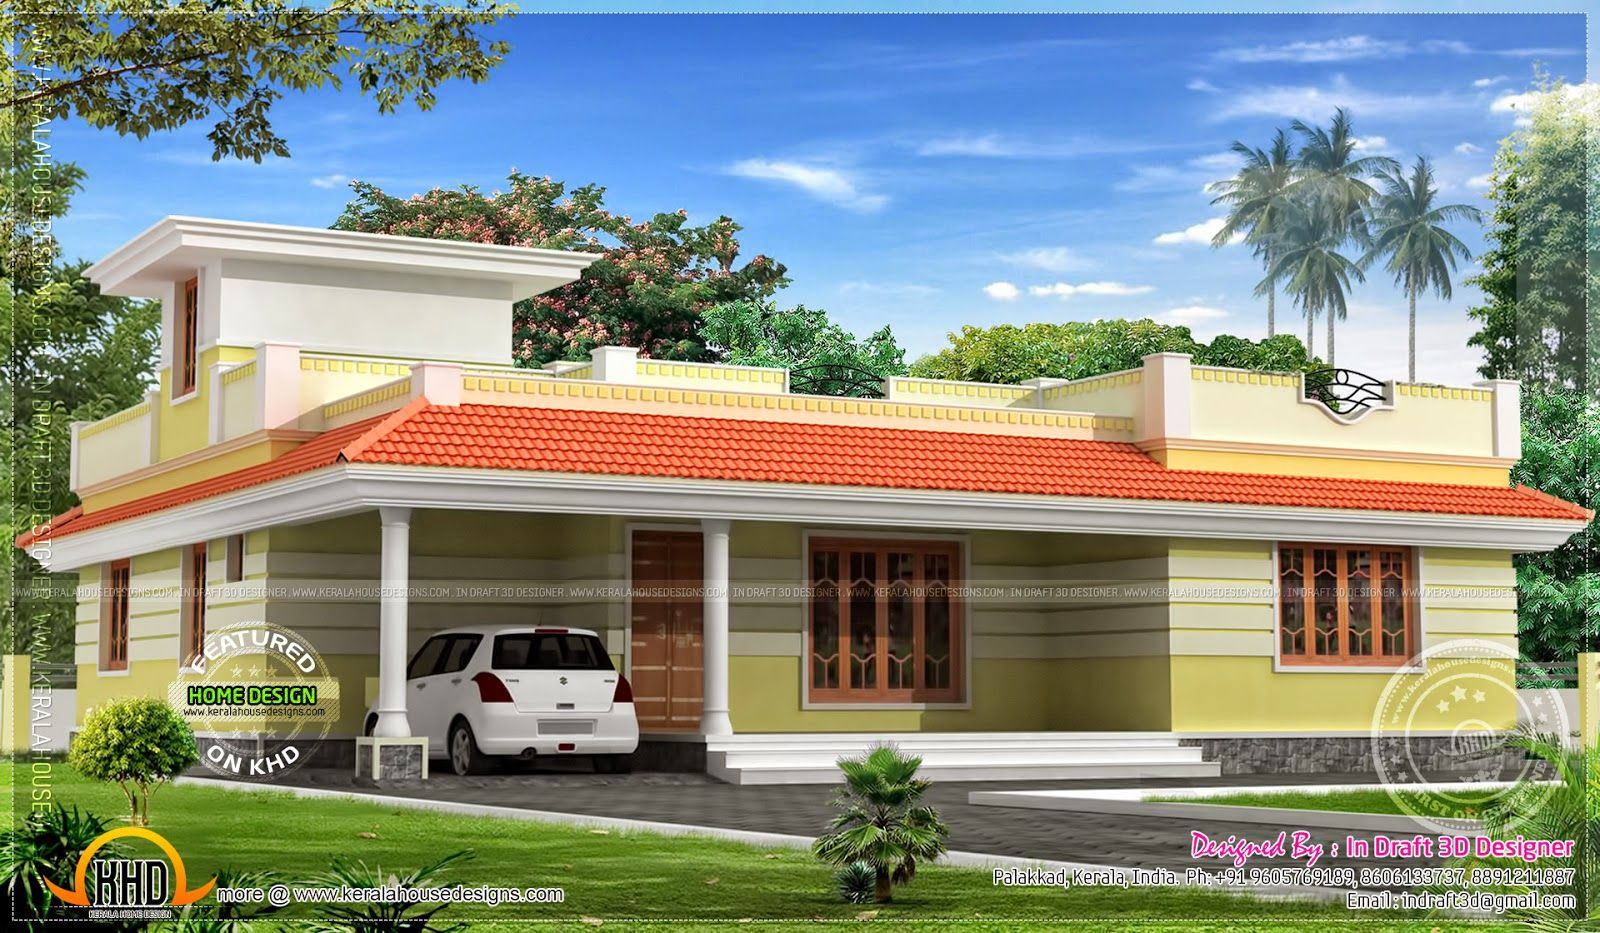 1858 Sq Feet Kerala Model Single Floor Home Simple House Design Single Floor House Design House Architecture Design